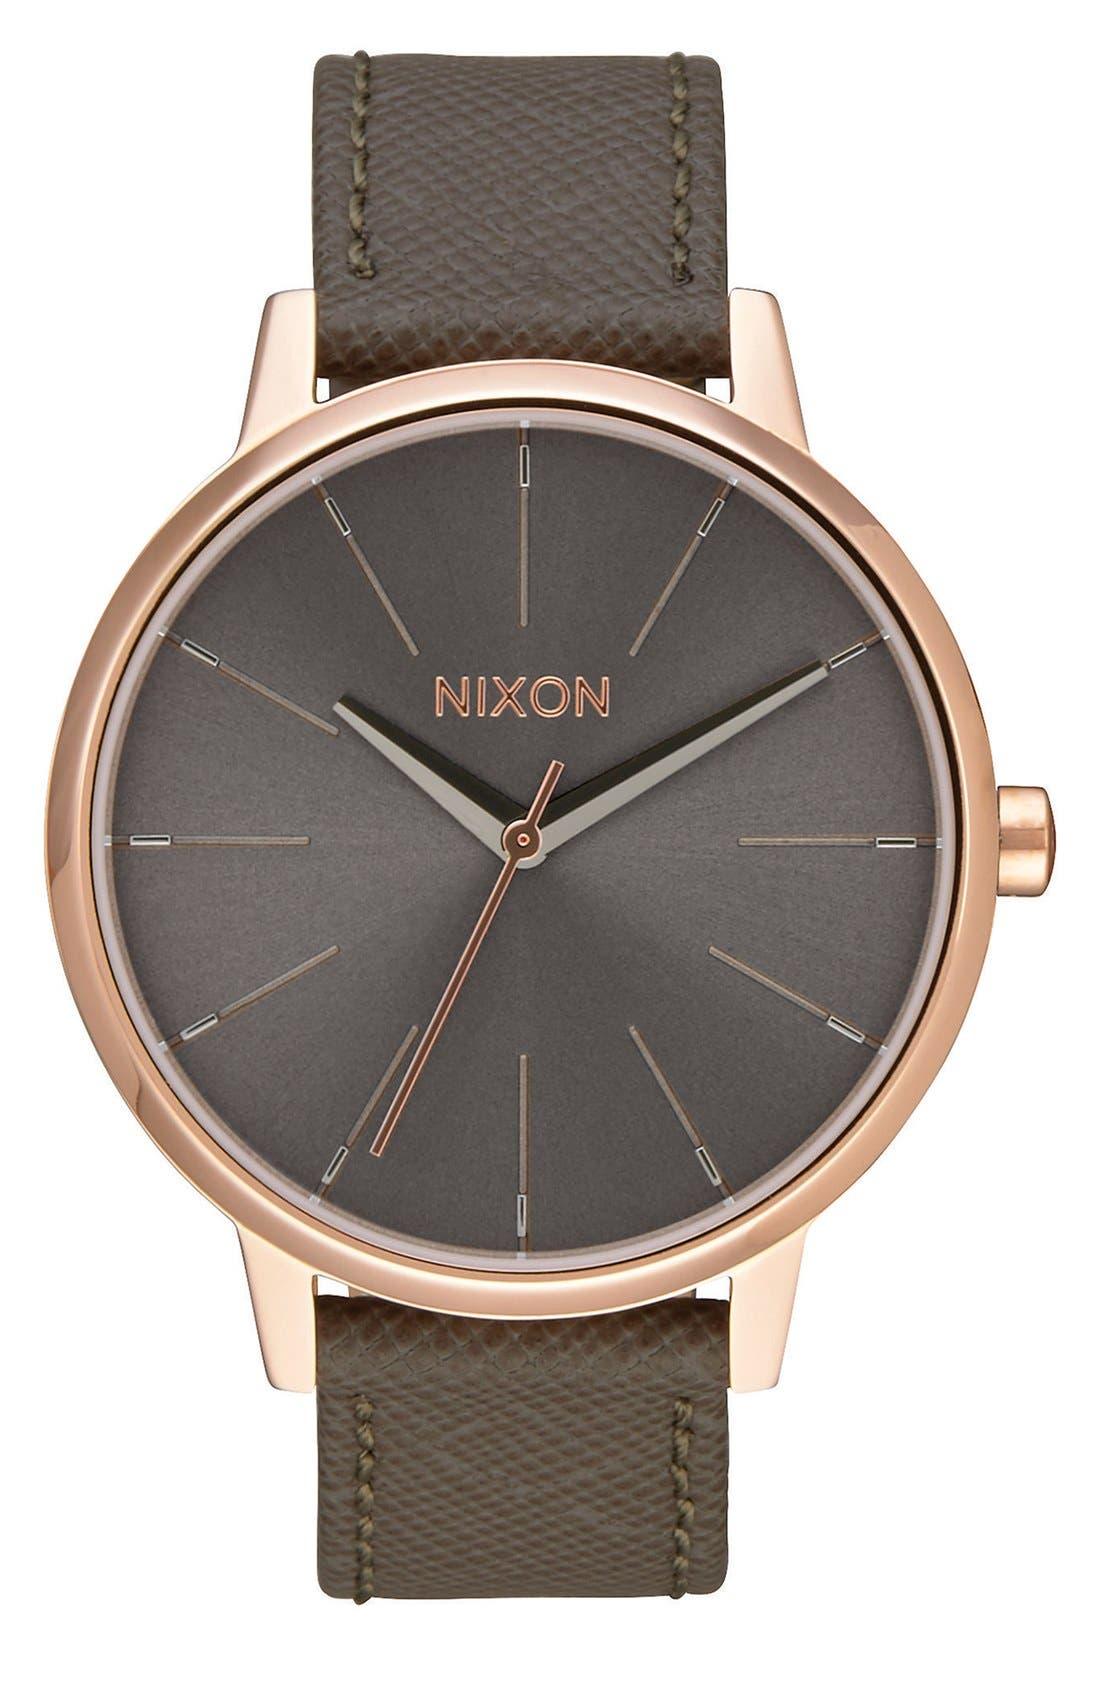 Main Image - Nixon 'Kensington' Leather Strap Watch, 37mm